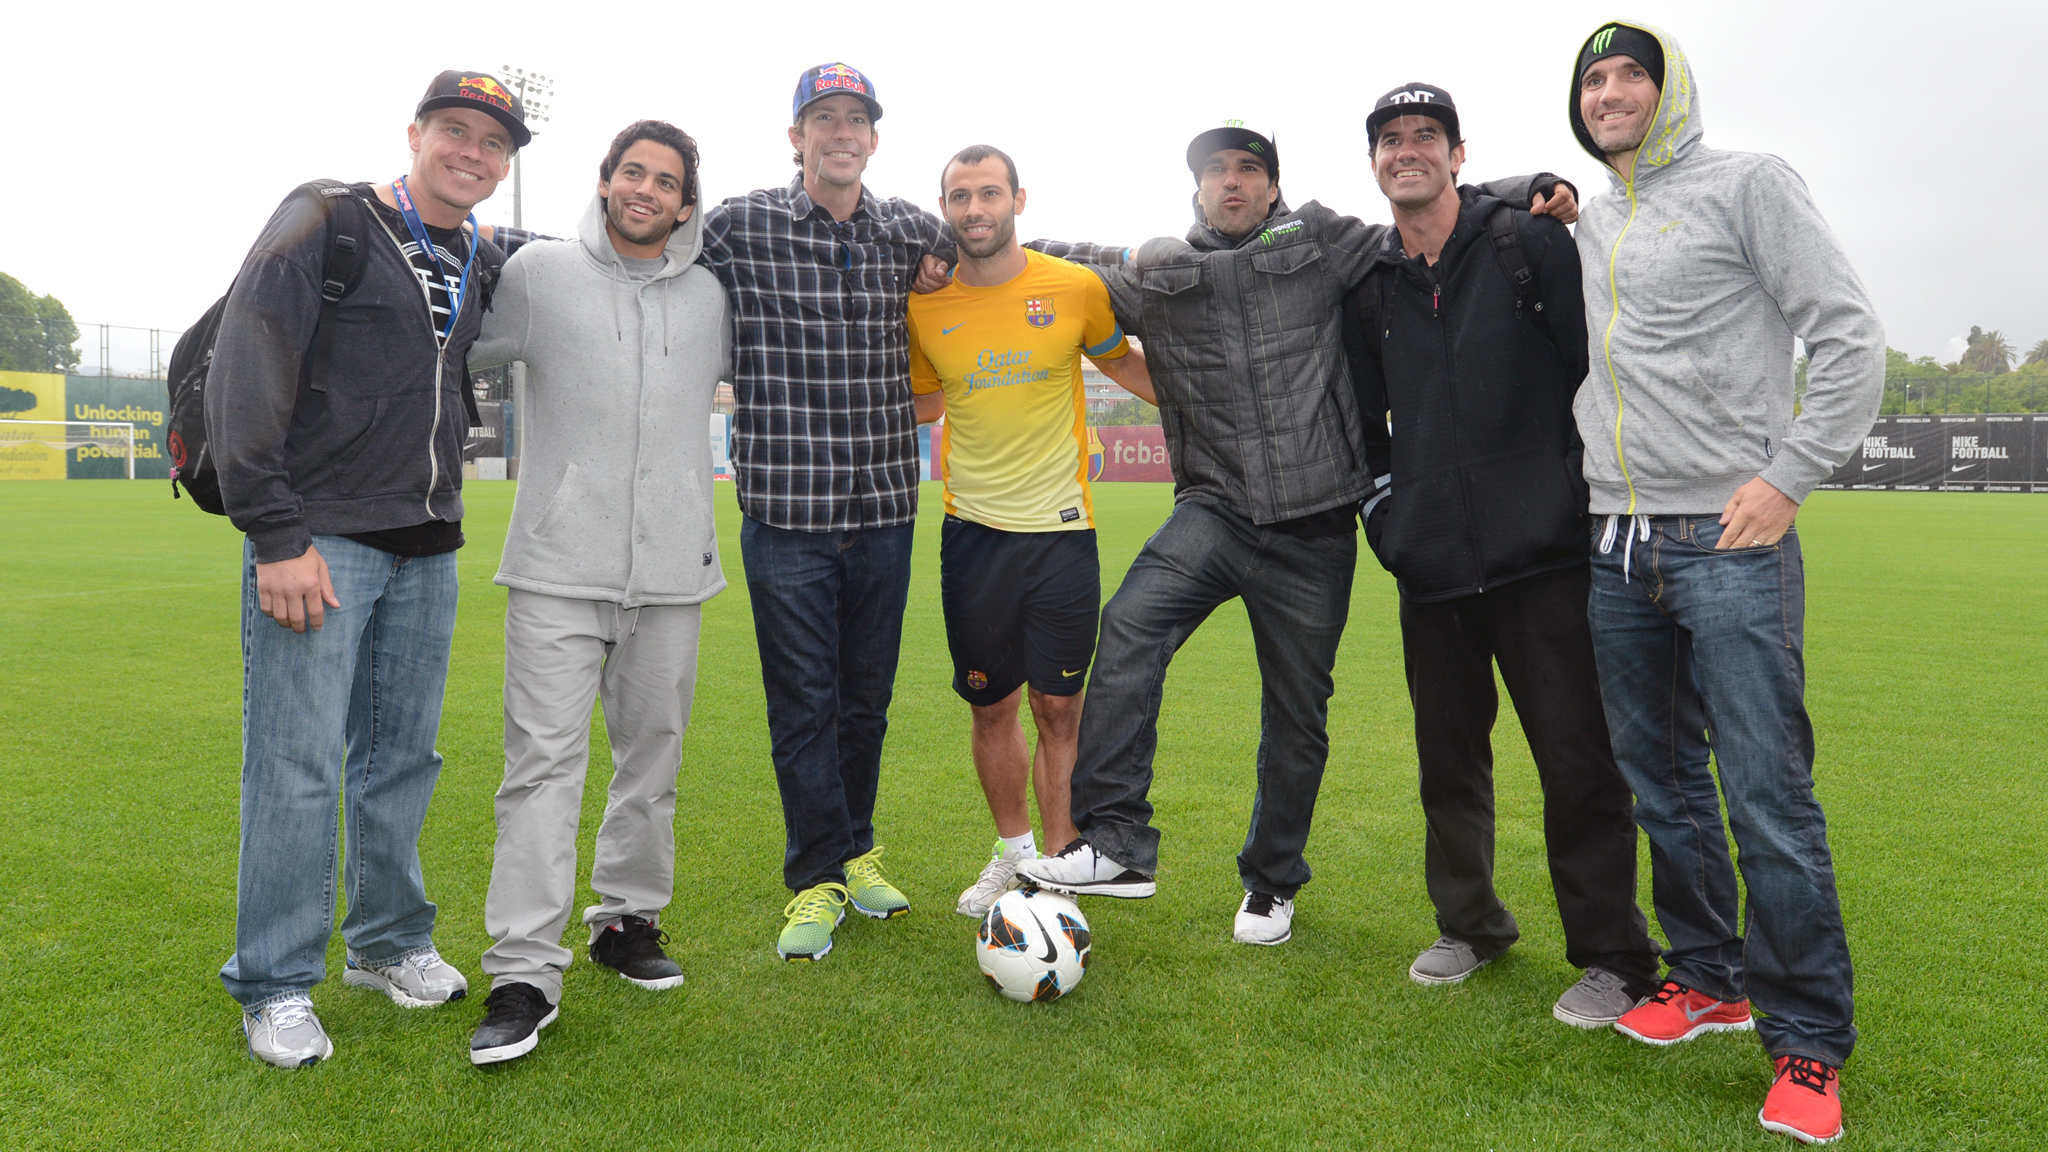 Kevin Robinson, Paul Rodriguez, Travis Pastrana, Javier Mascherano, Bob Burnquist, Jamie Bestwick, Edgar Torronteras